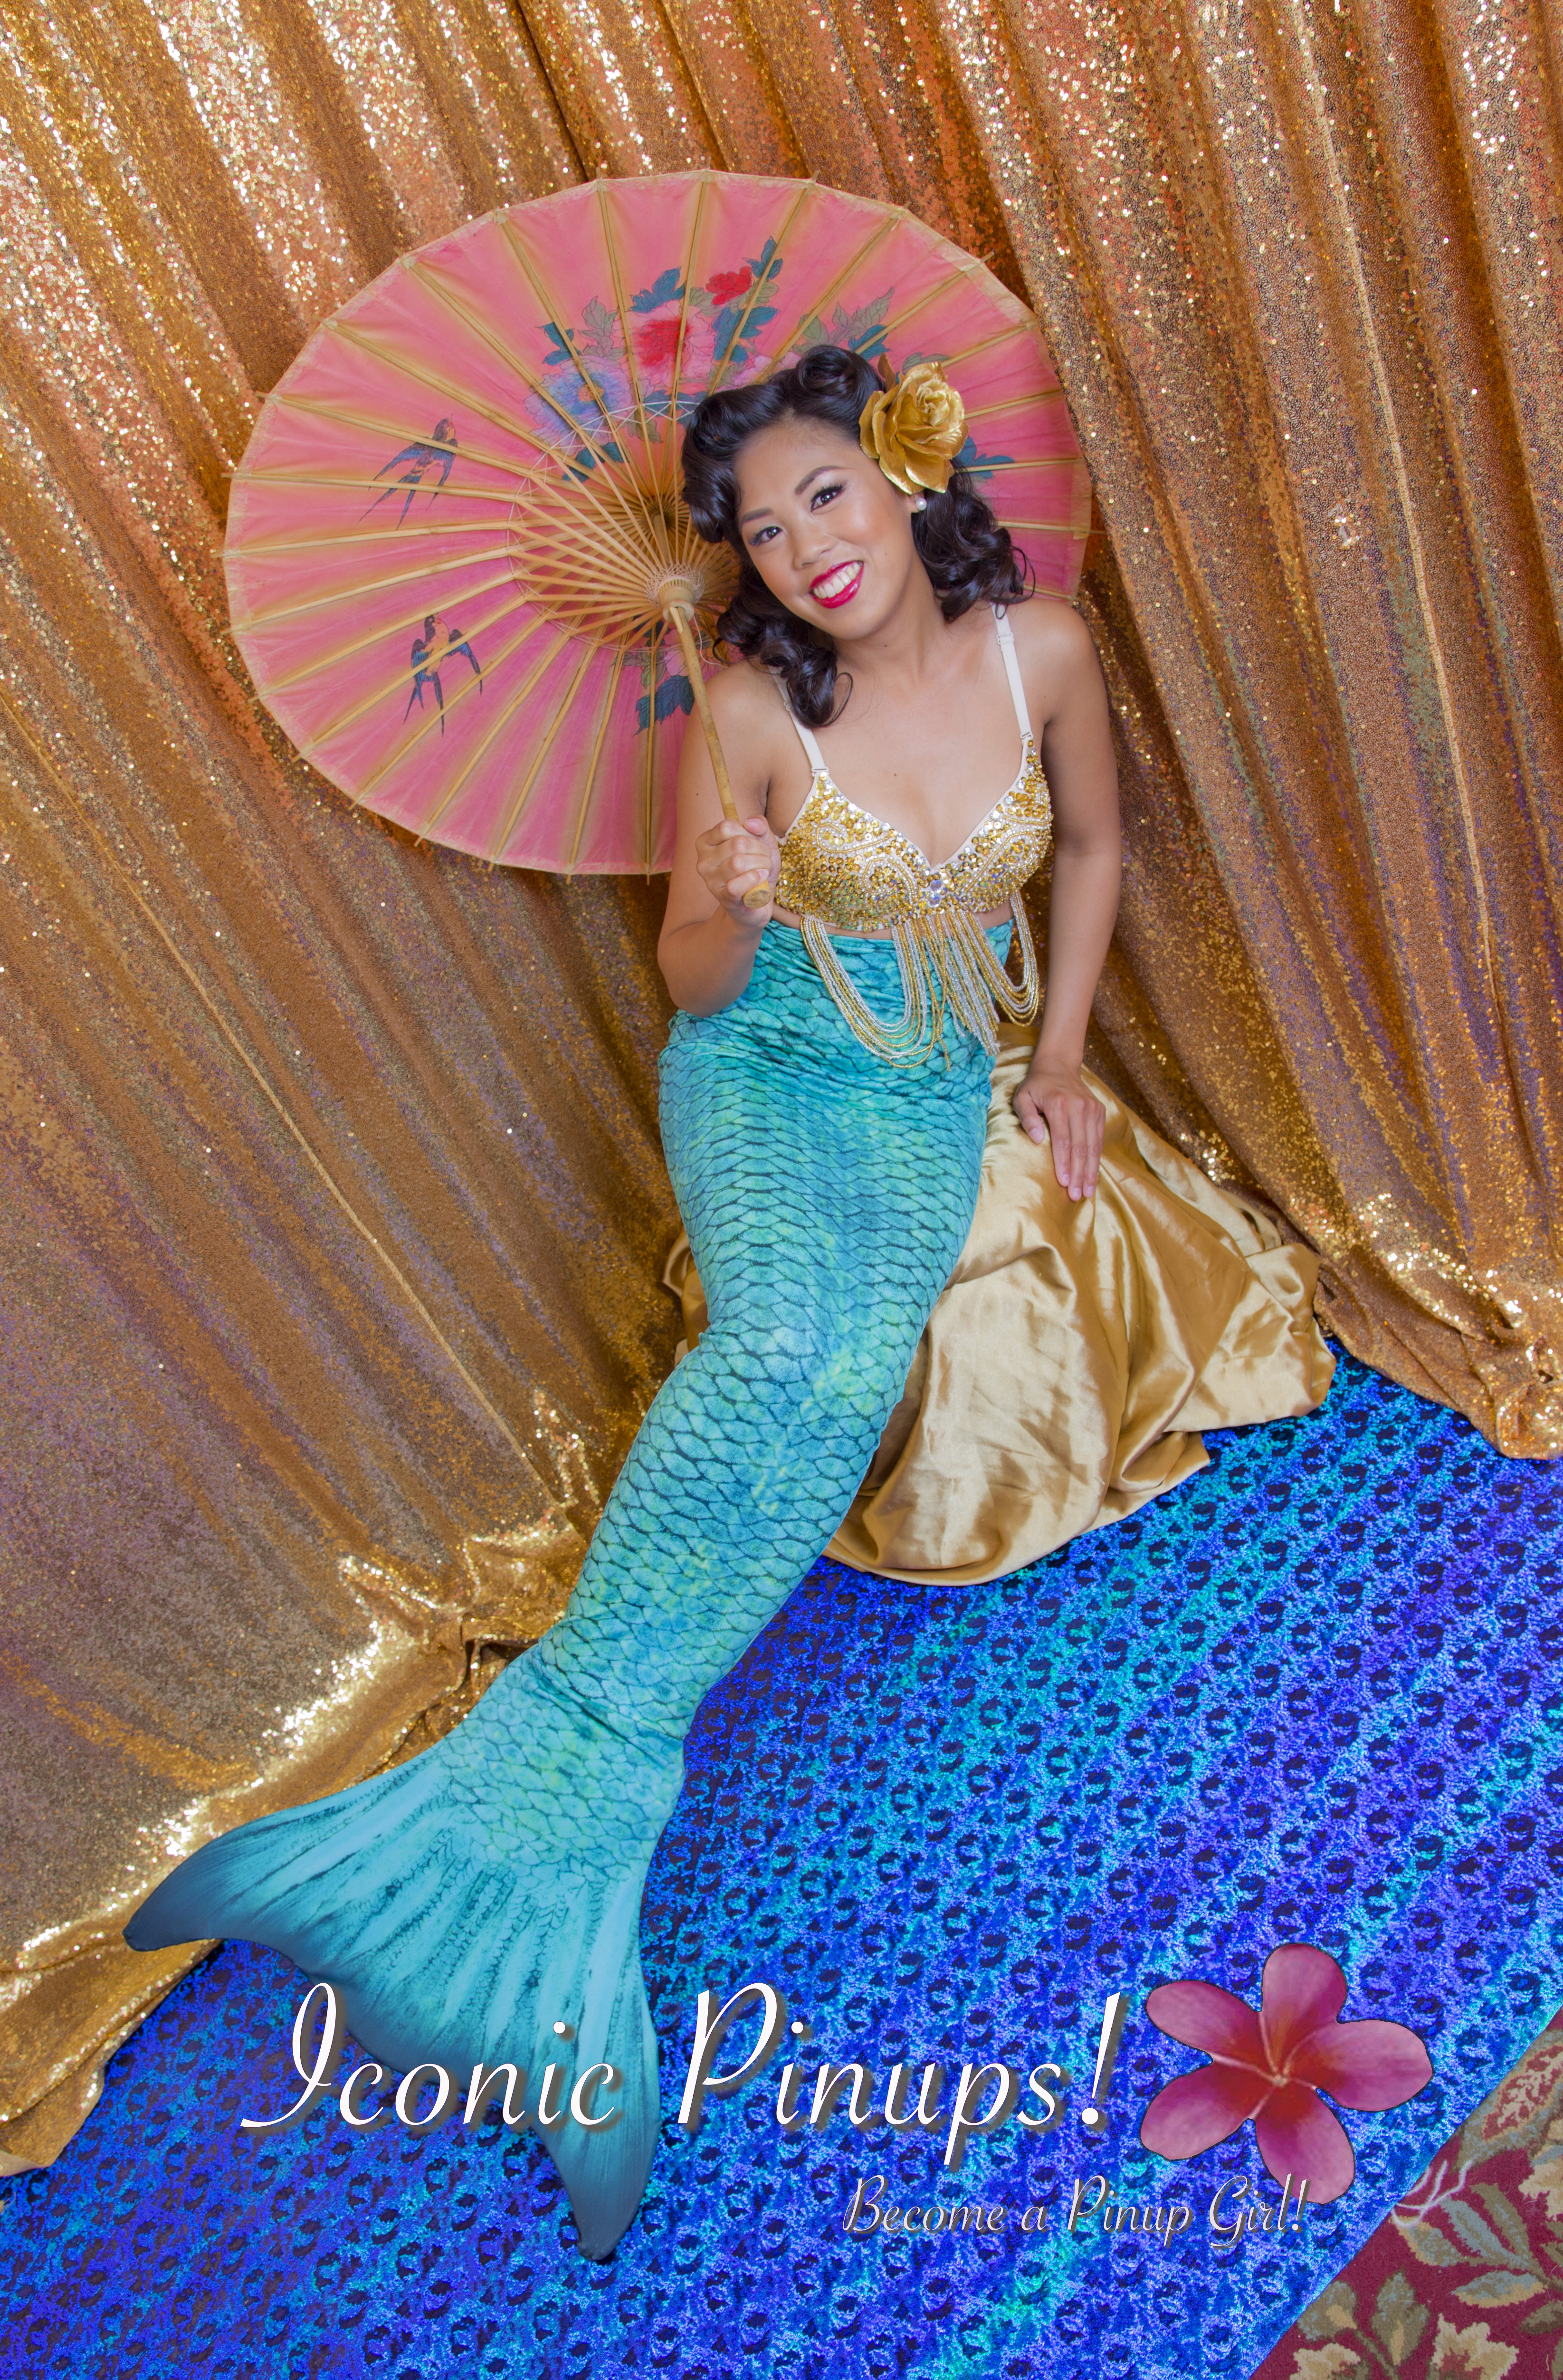 Mermaid Photo Shoots Los Angeles  Be a Pinup Mermaid!  bd01cc5c7